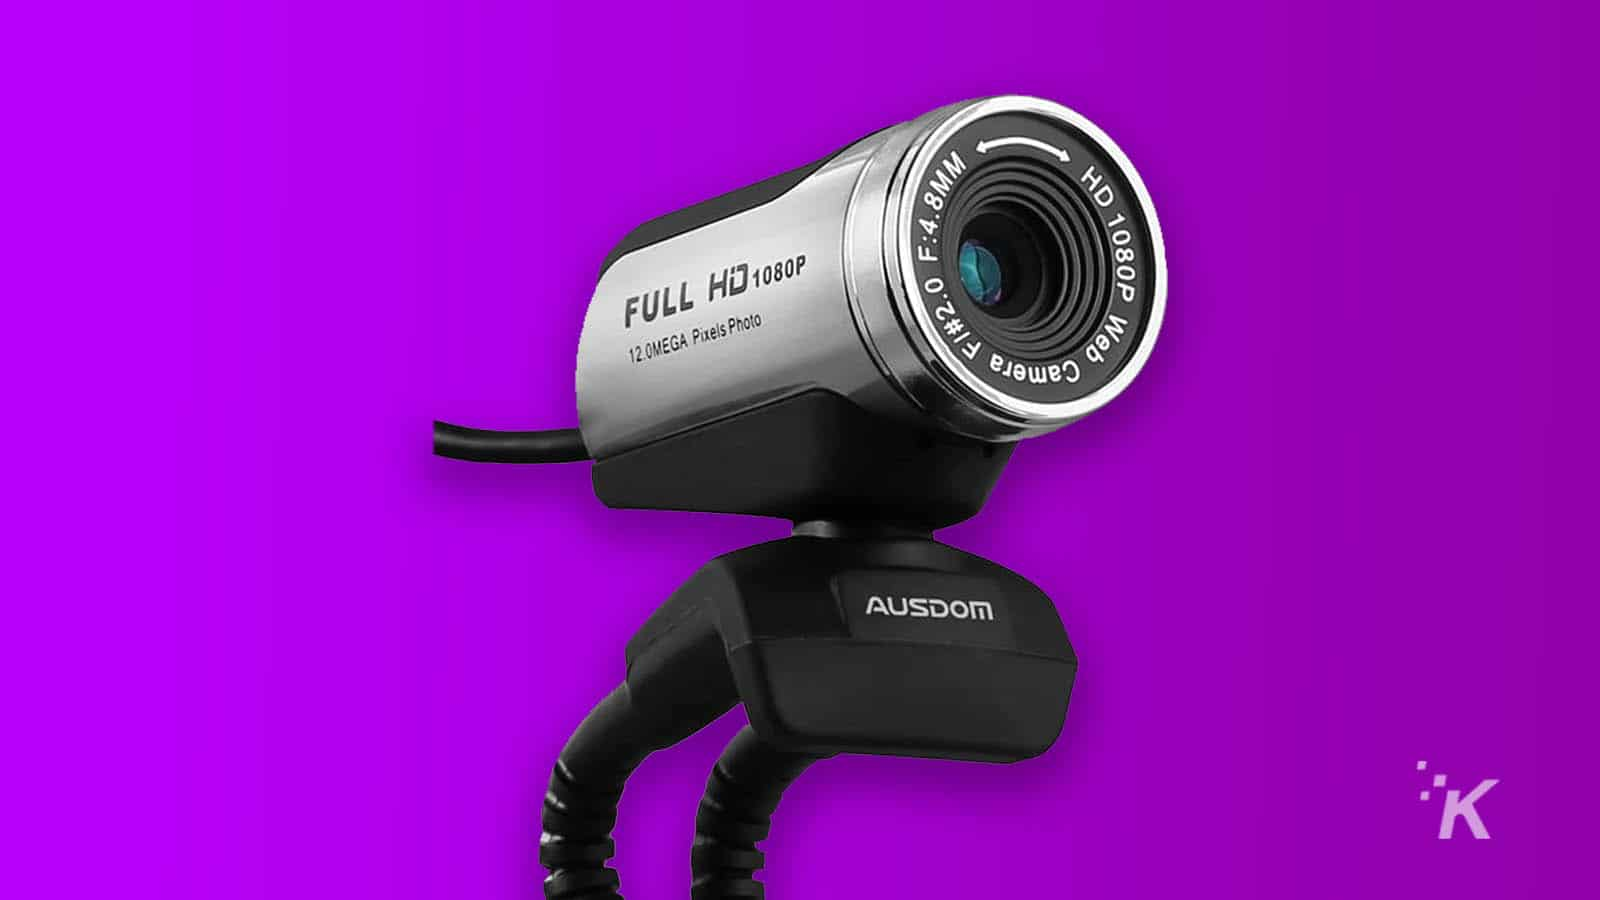 ausdom webcam on purple background